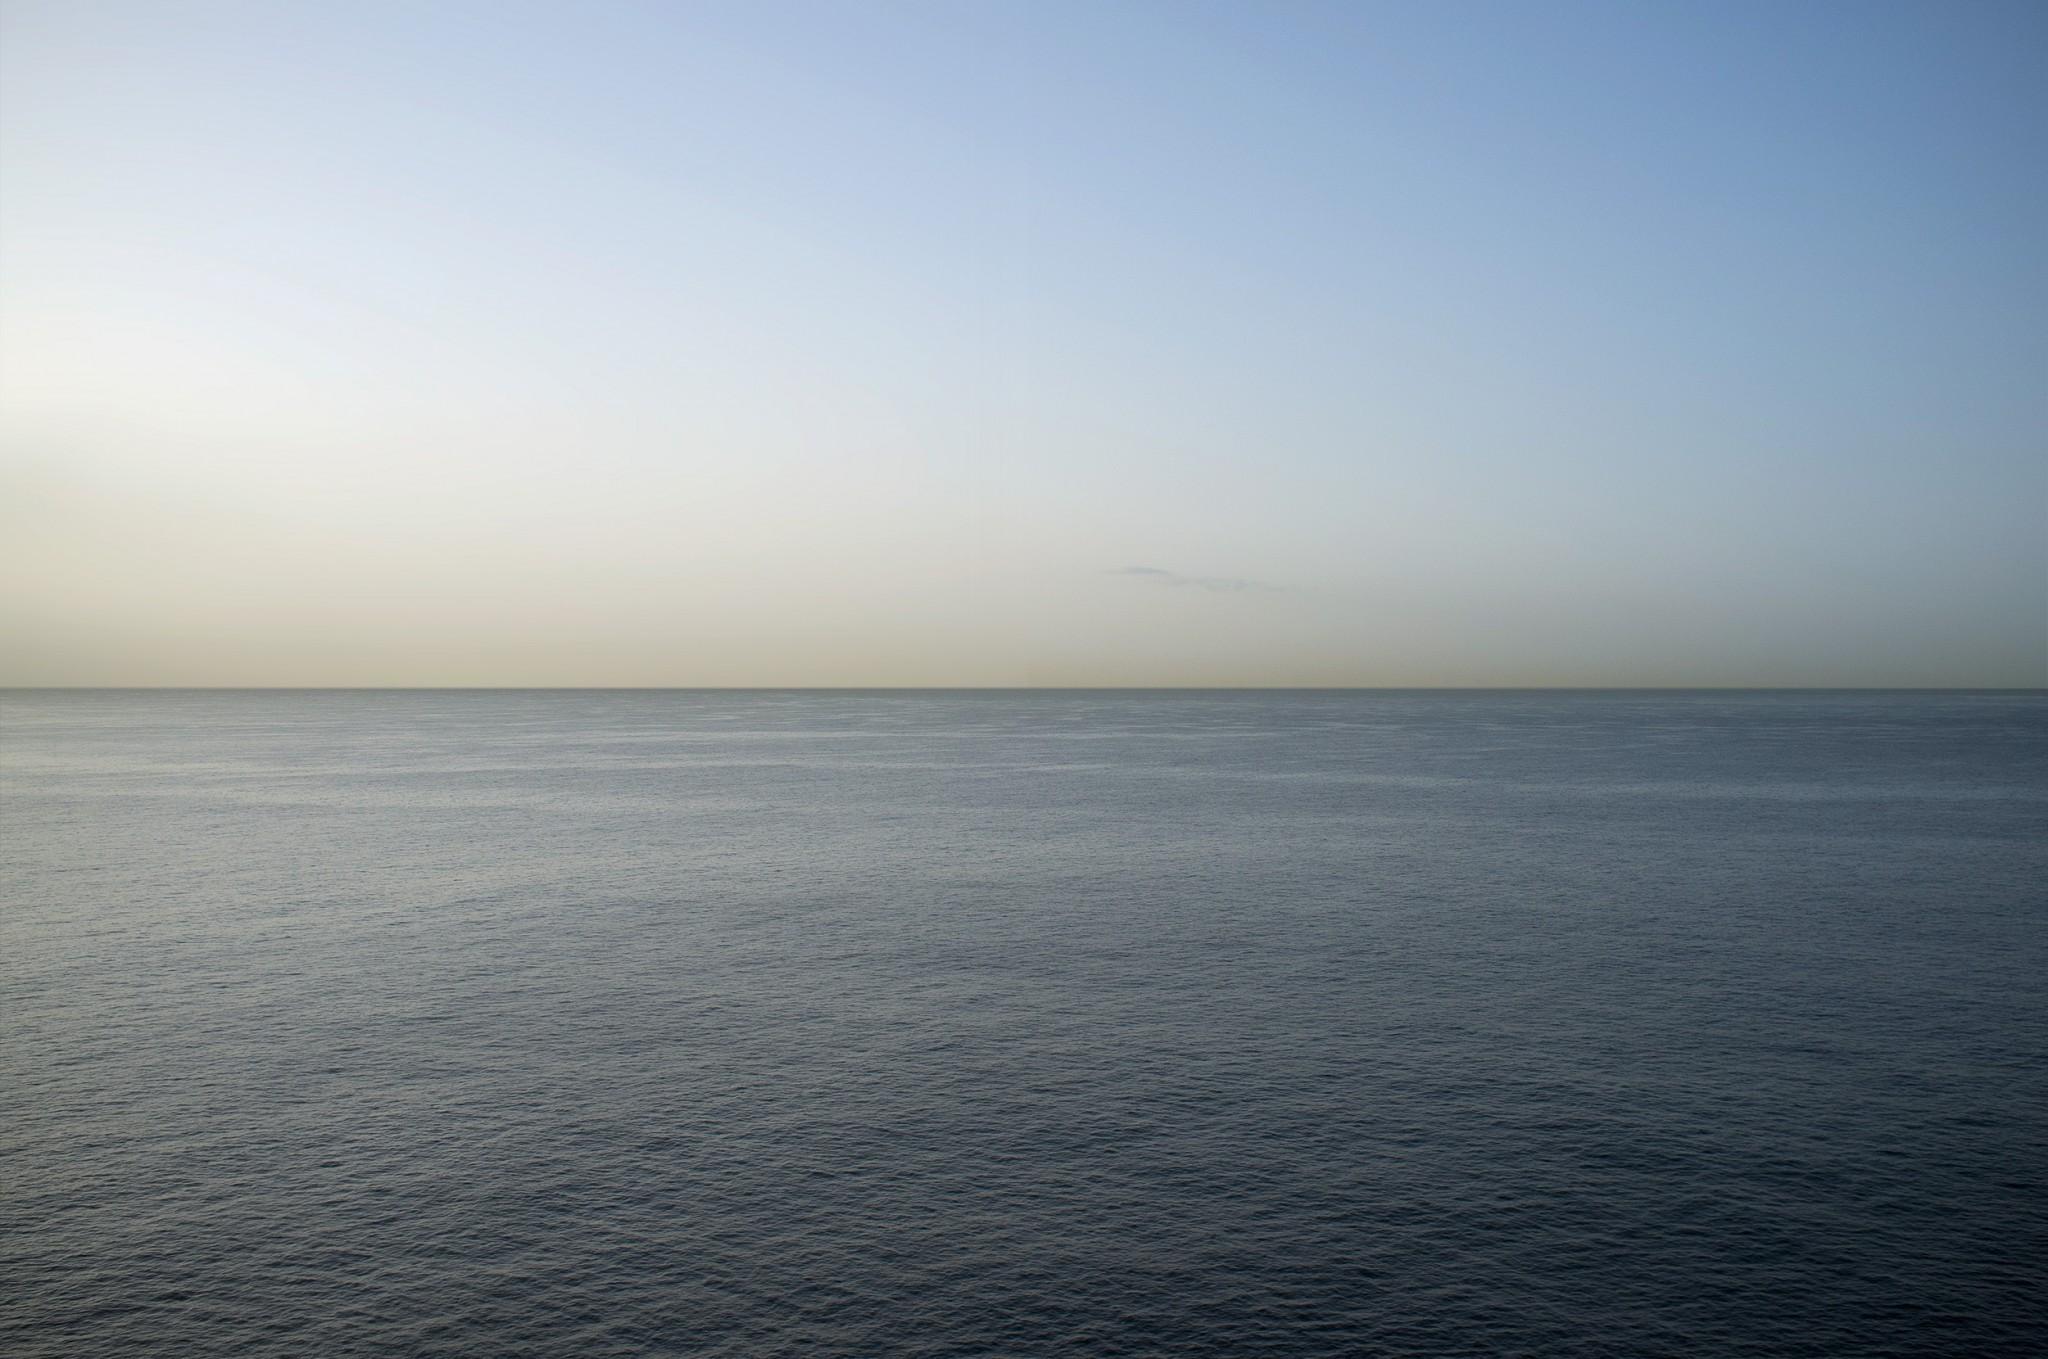 ocean II| © Fabrice Villard